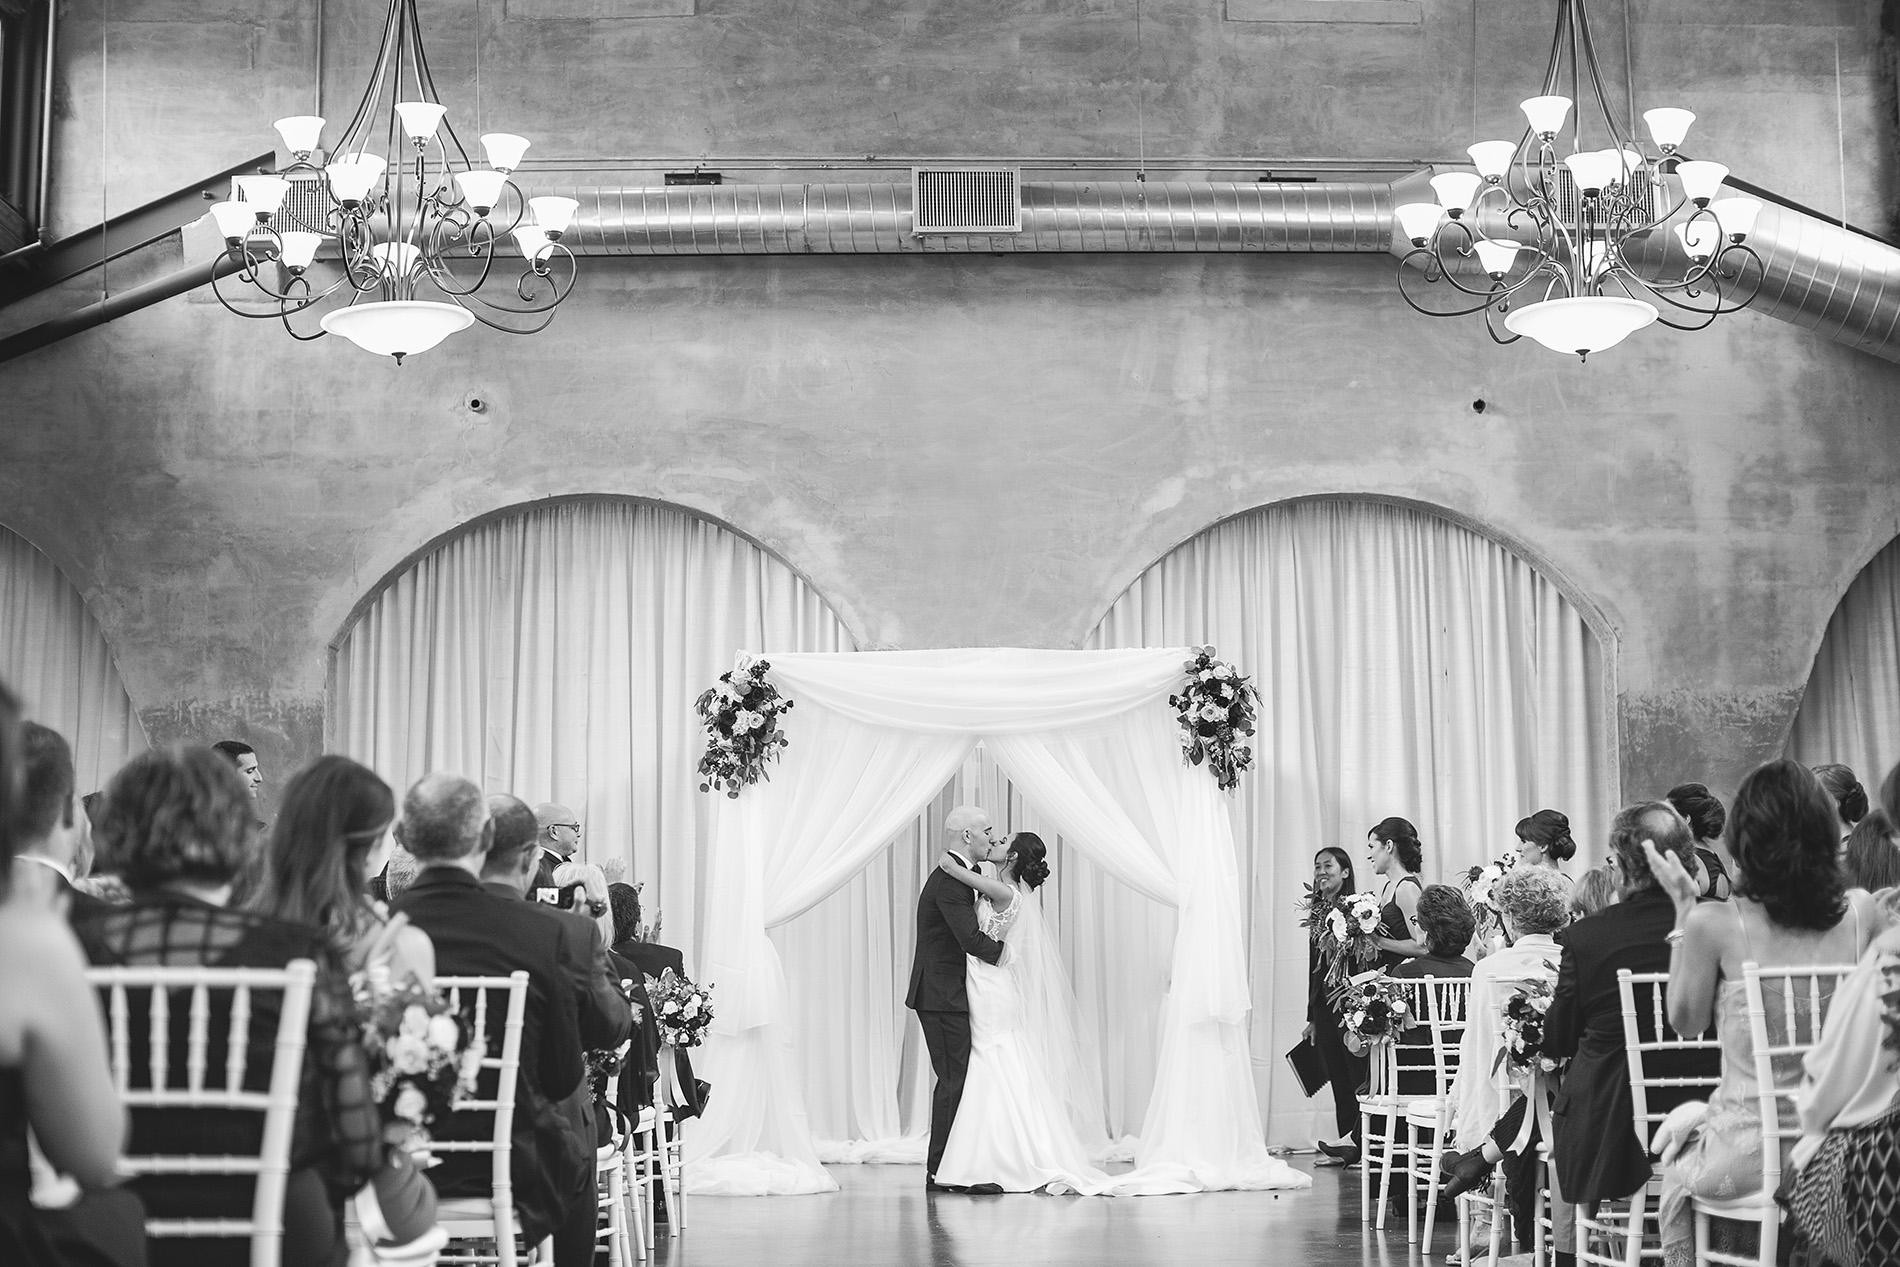 Houston-venue-Olde-Dobbin-Station-Romantic-Classic-Wedding-Photographer-065.jpg